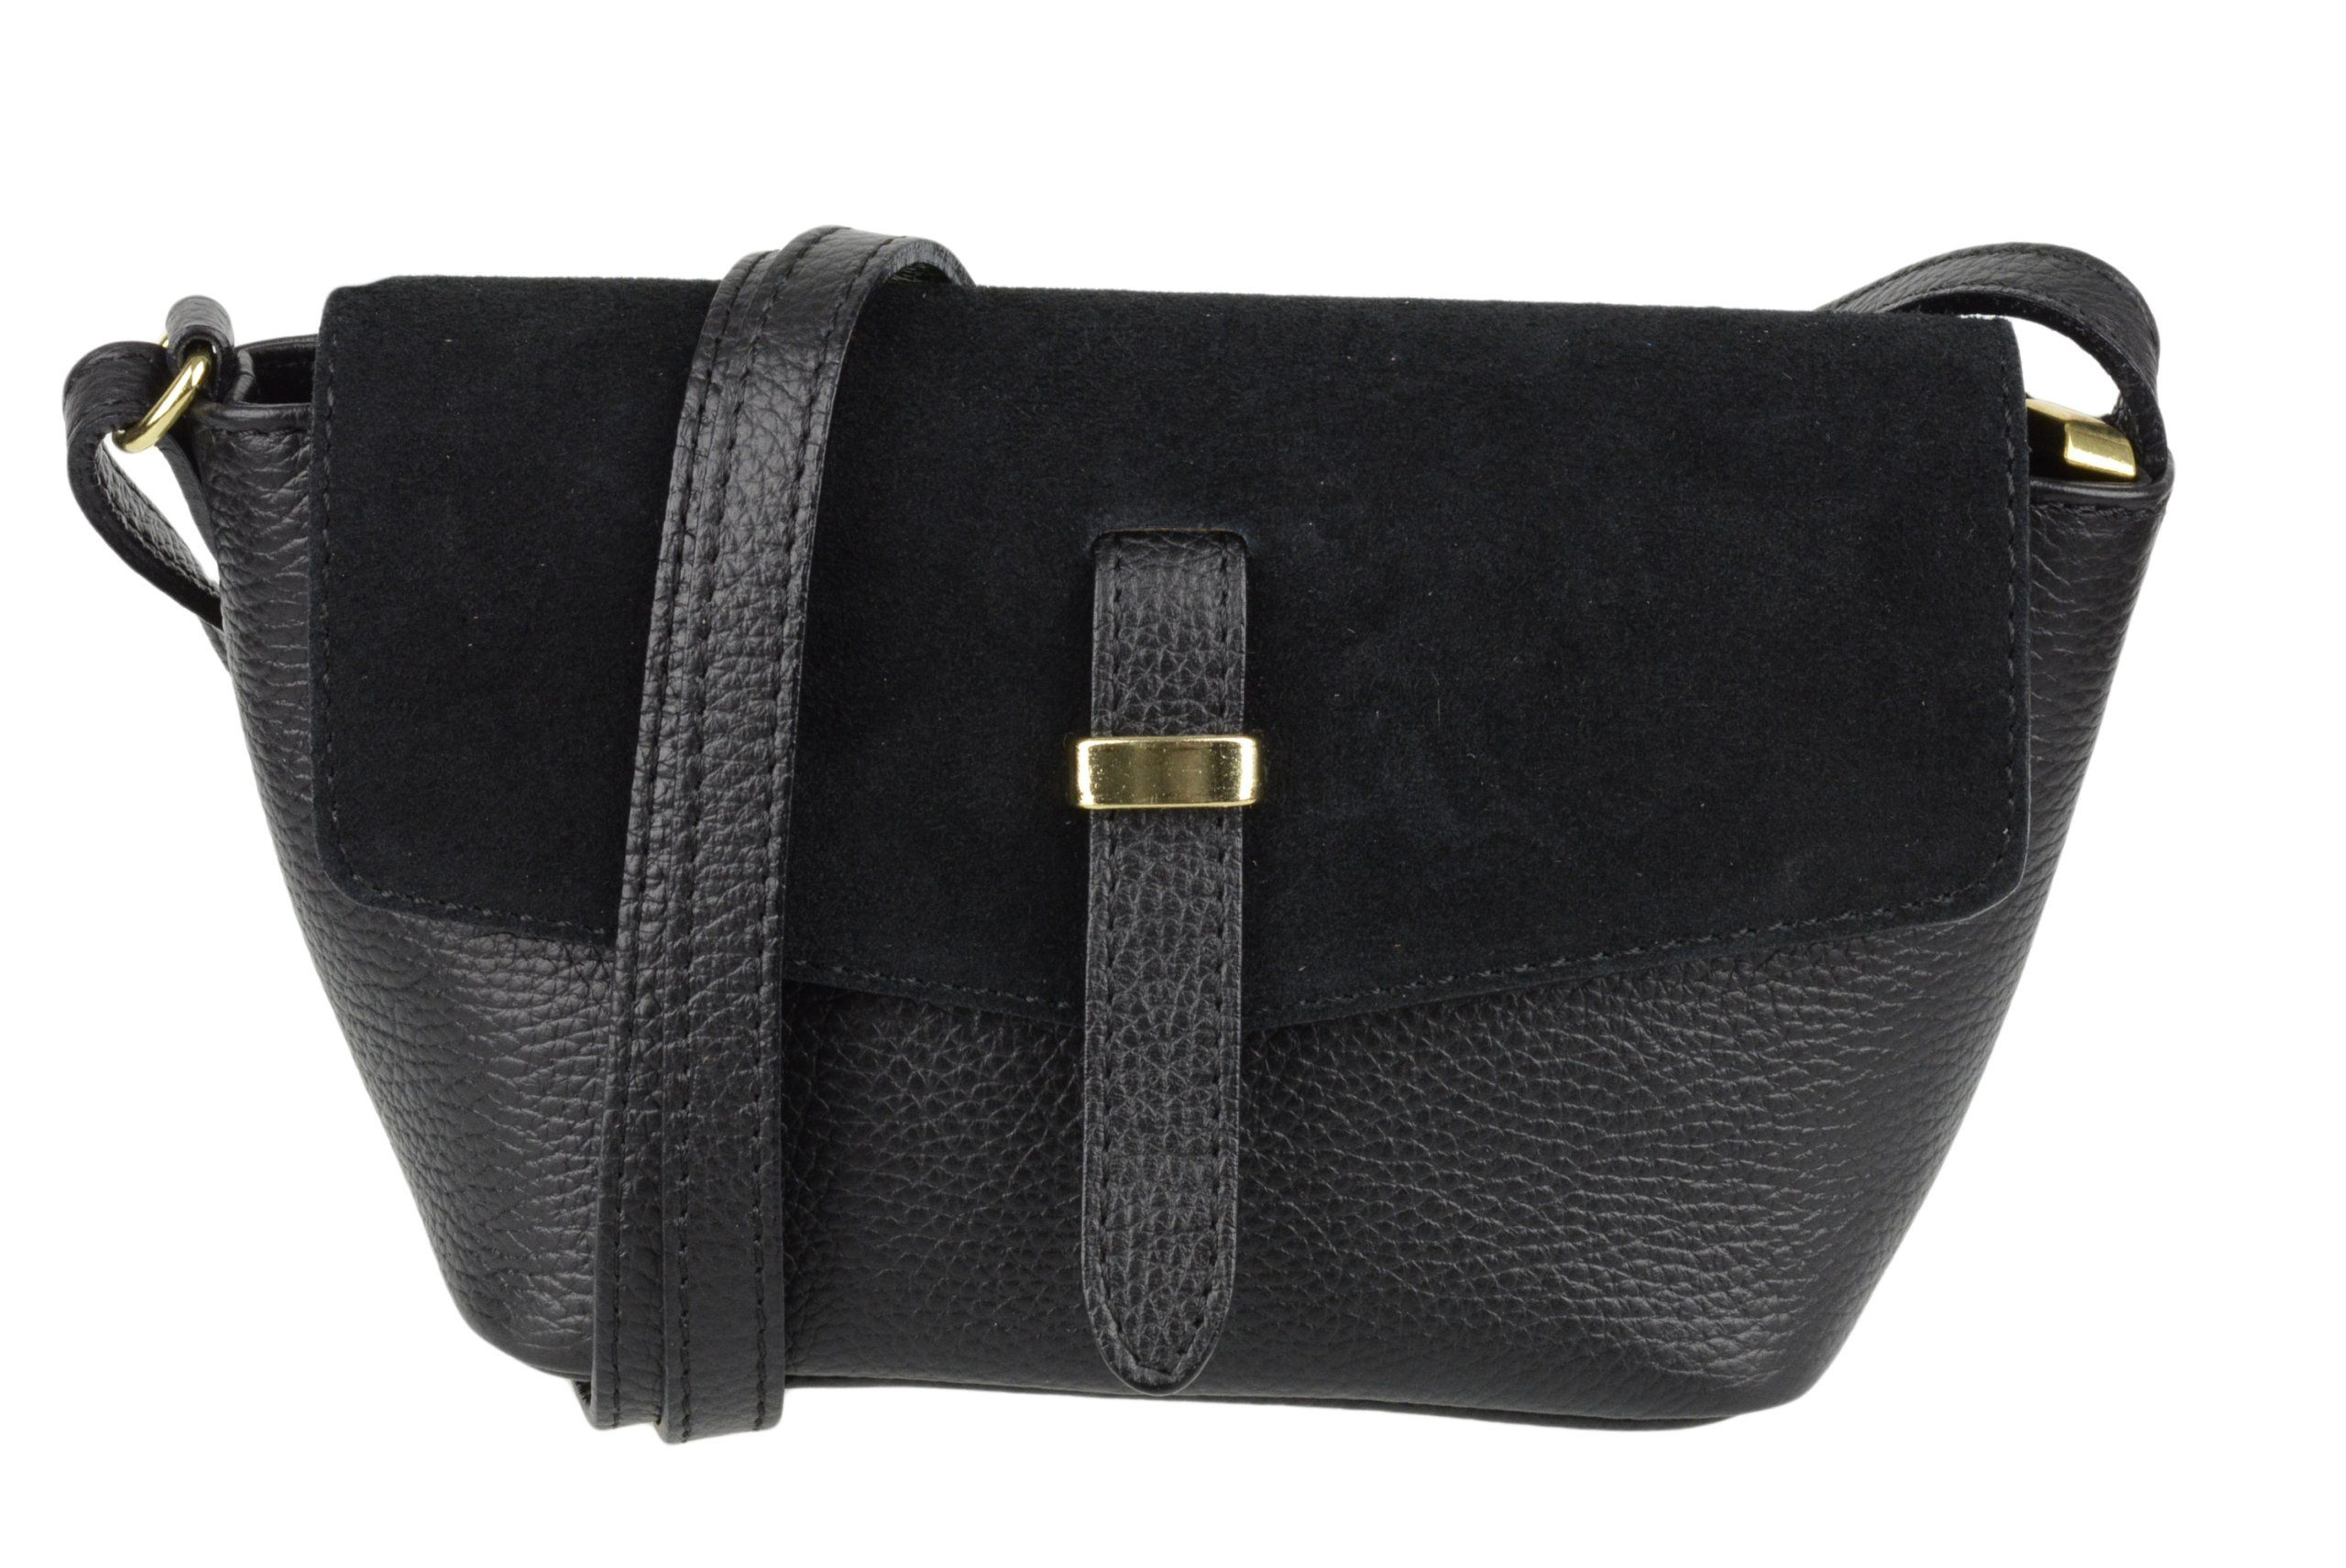 Vera Pelle Torebka Listonoszka Mala Czarna 14899 7209263385 Oficjalne Archiwum Allegro Camera Bag Bags Fashion